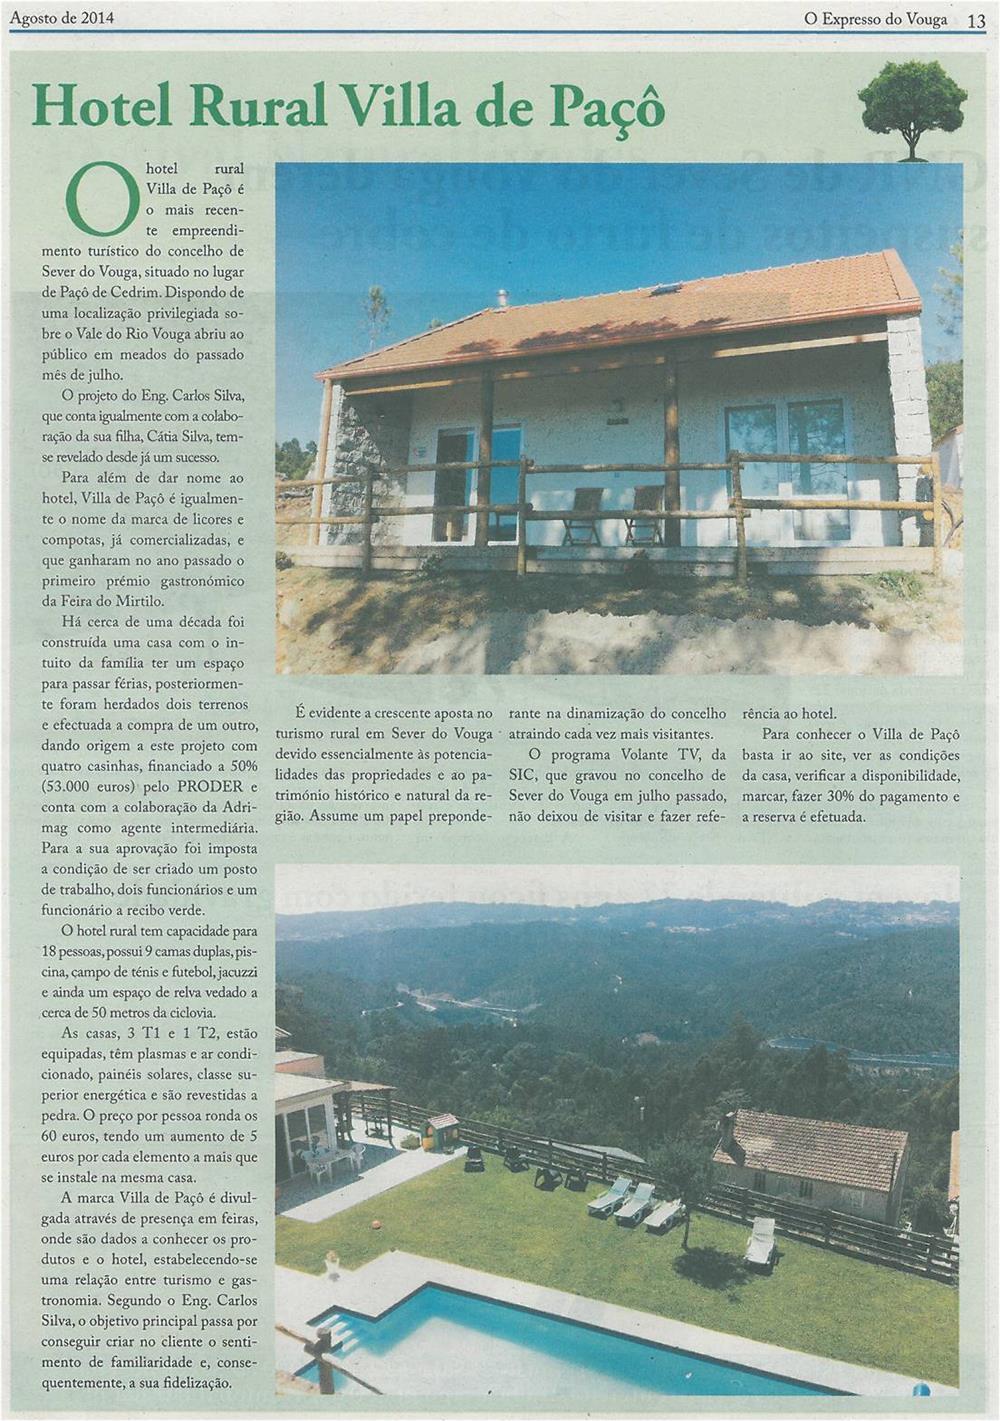 EV-ago'14-p13-Hotel Rural Villa de Paçô.jpg